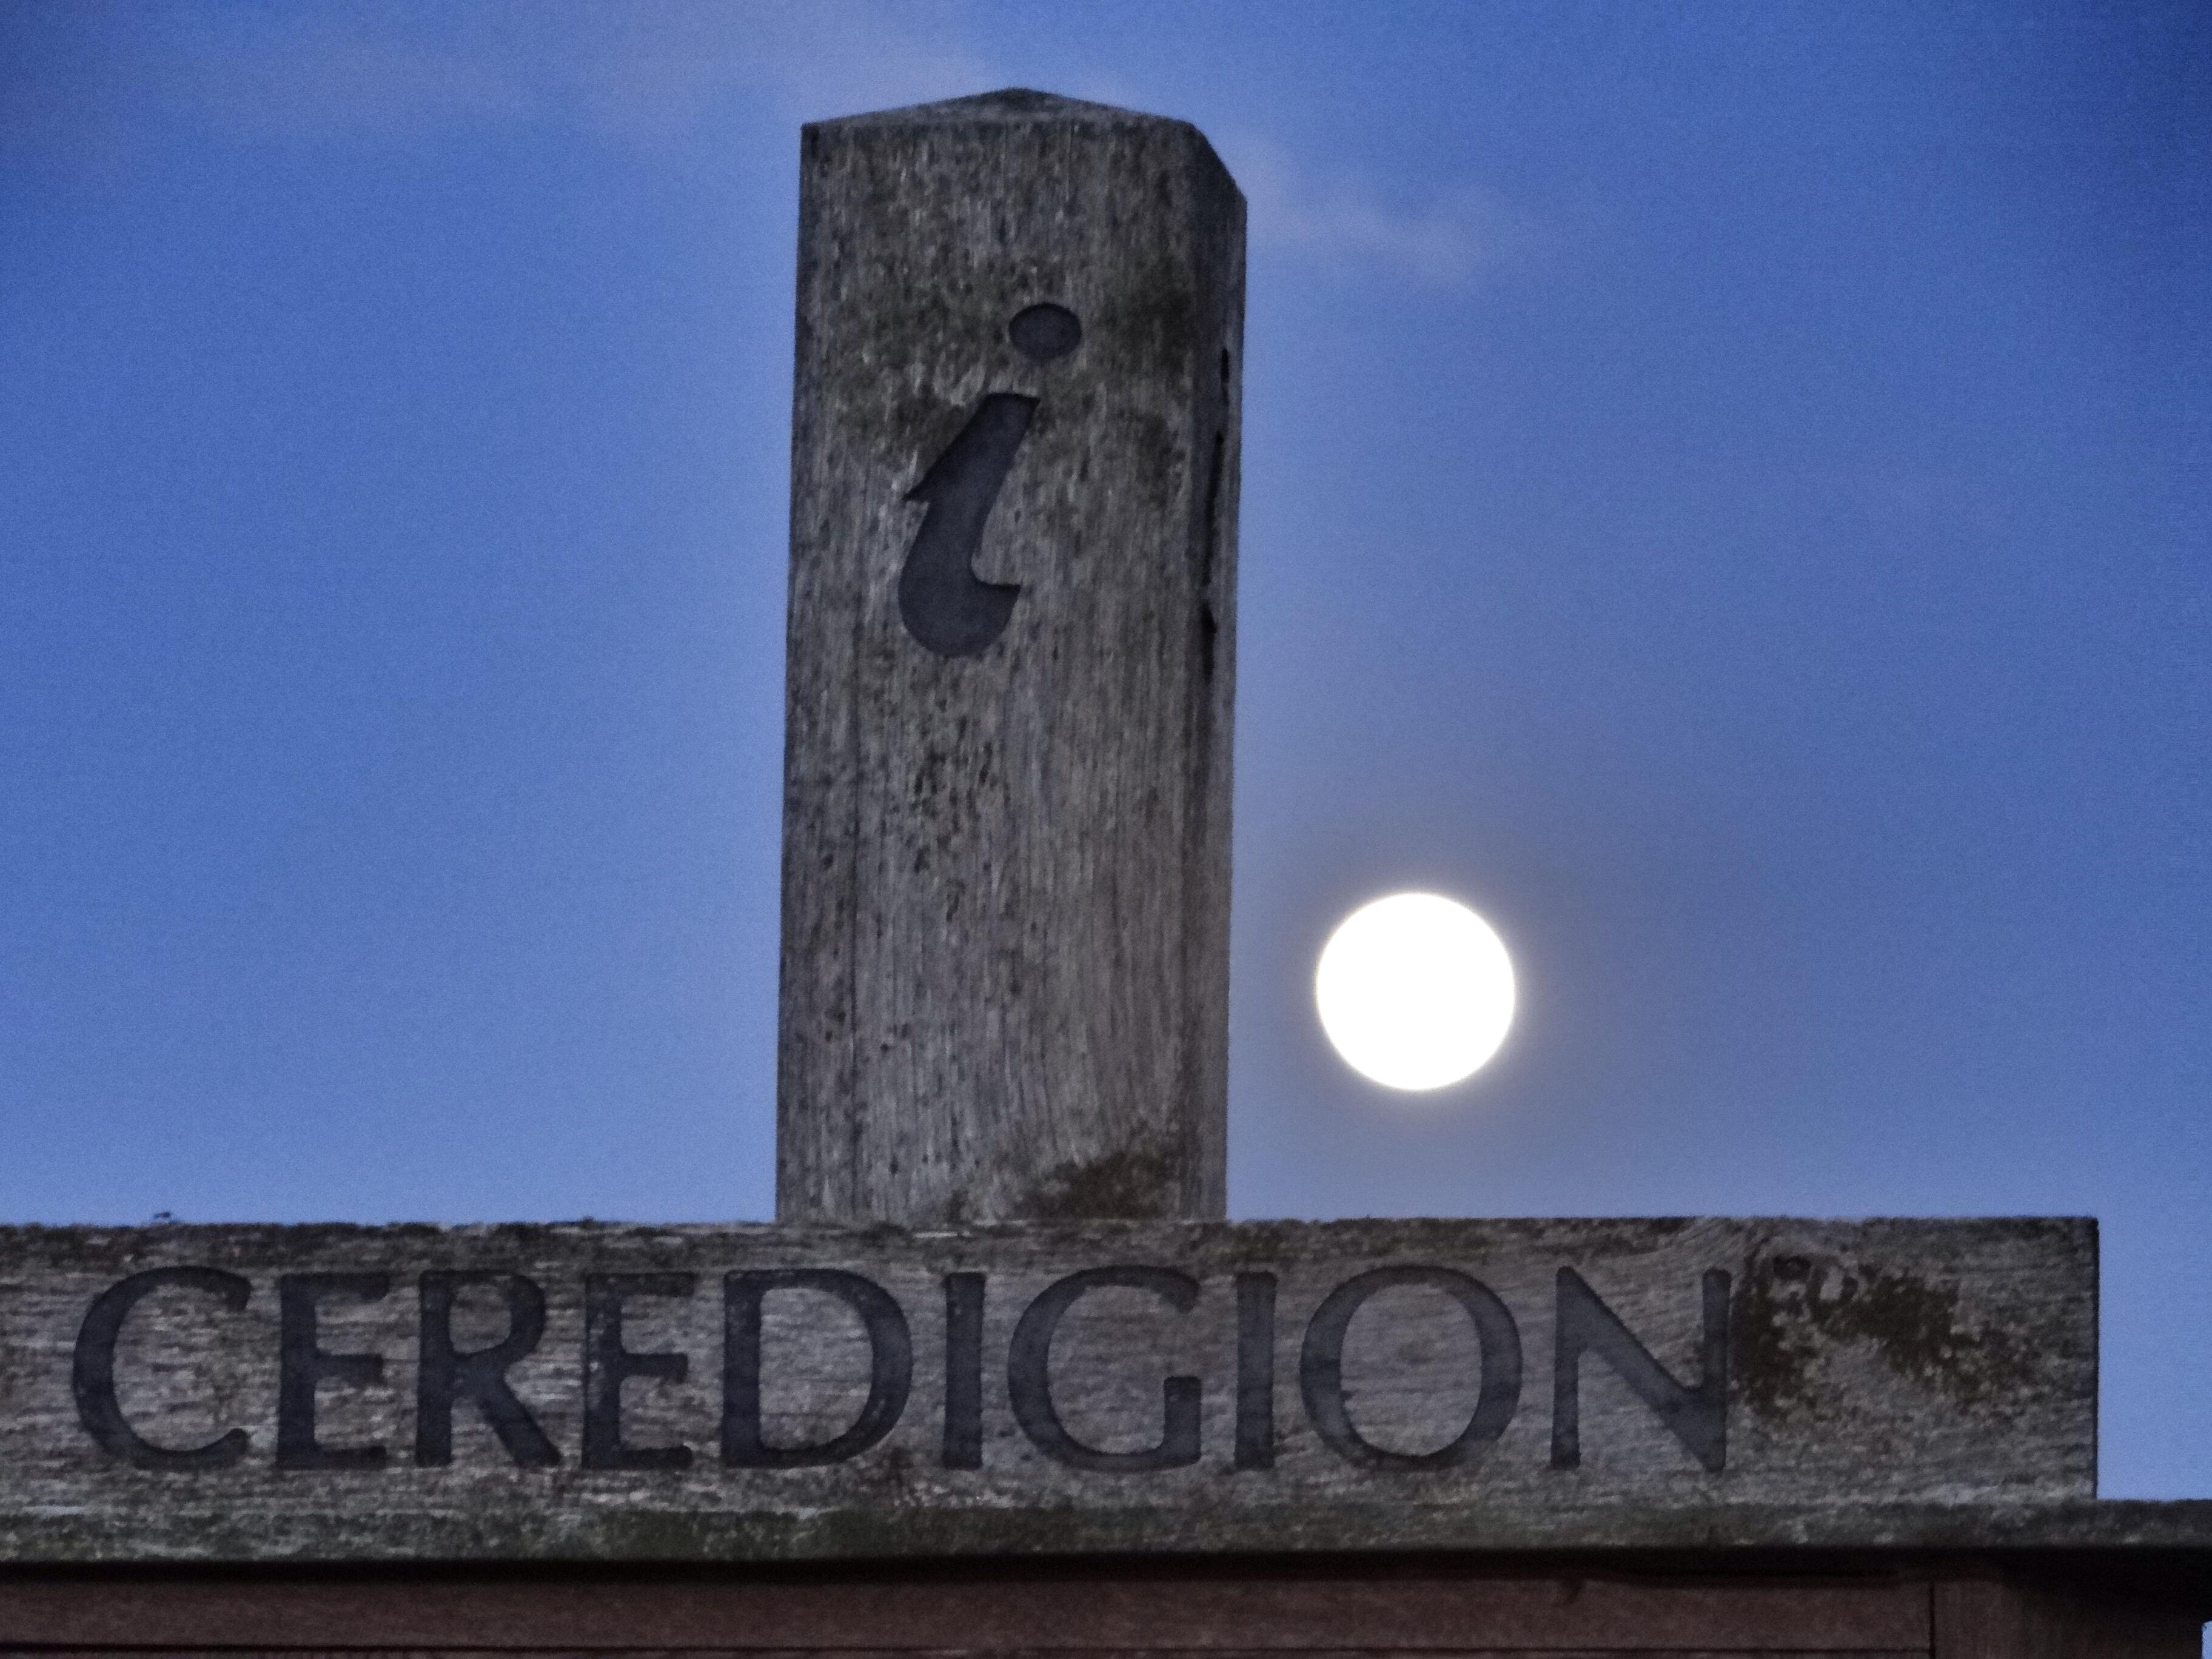 Moon rise over ceredigion Fiona Balchin